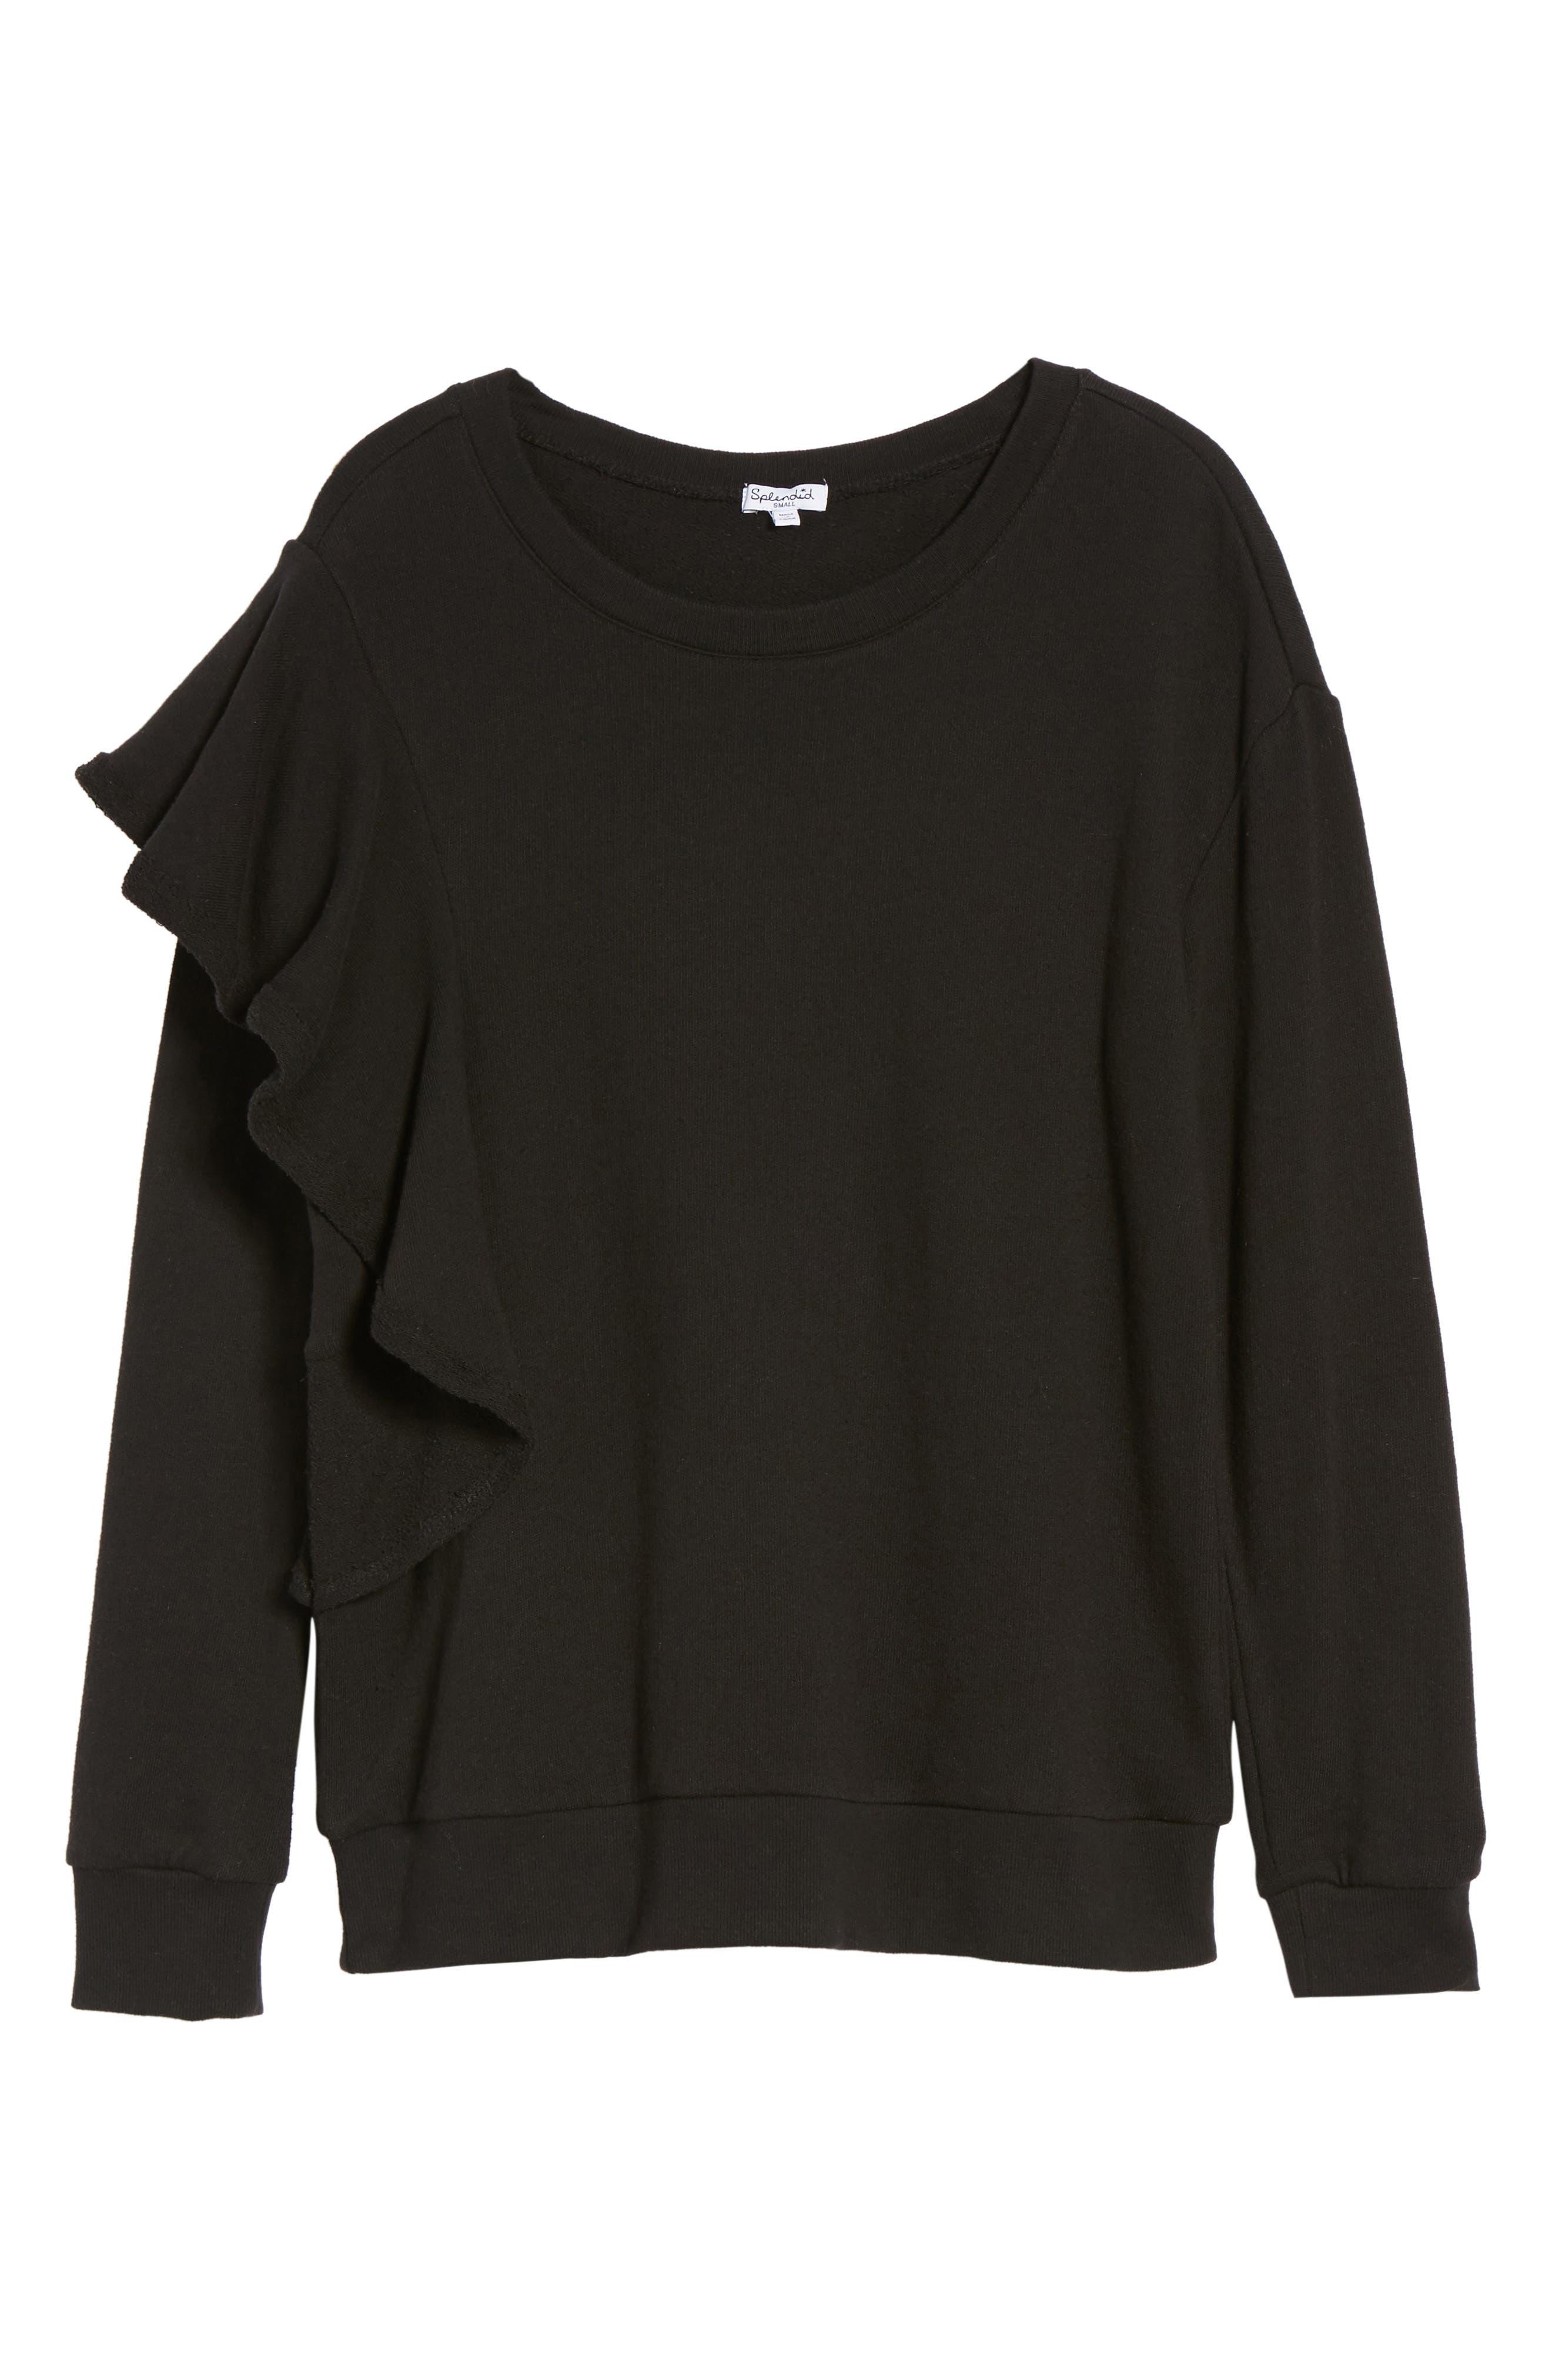 West Fourth Ruffle Sweatshirt,                             Alternate thumbnail 6, color,                             001